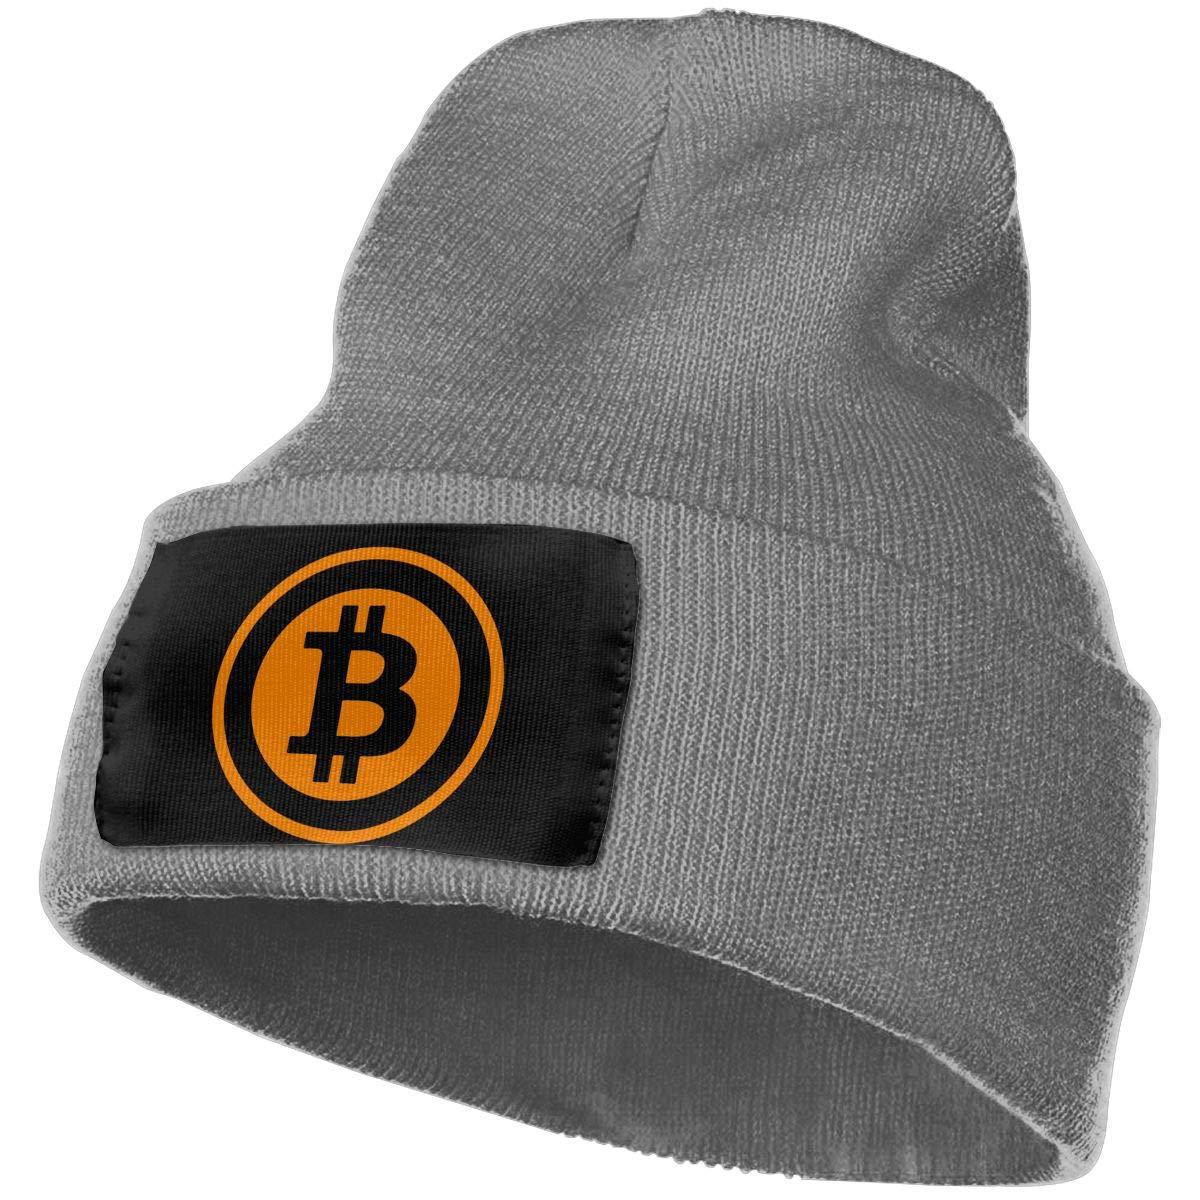 Warm Winter Hat Knit Beanie Skull Cap Cuff Beanie Hat Winter Hats for Men /& Women SLADDD1 Bitcoin 2